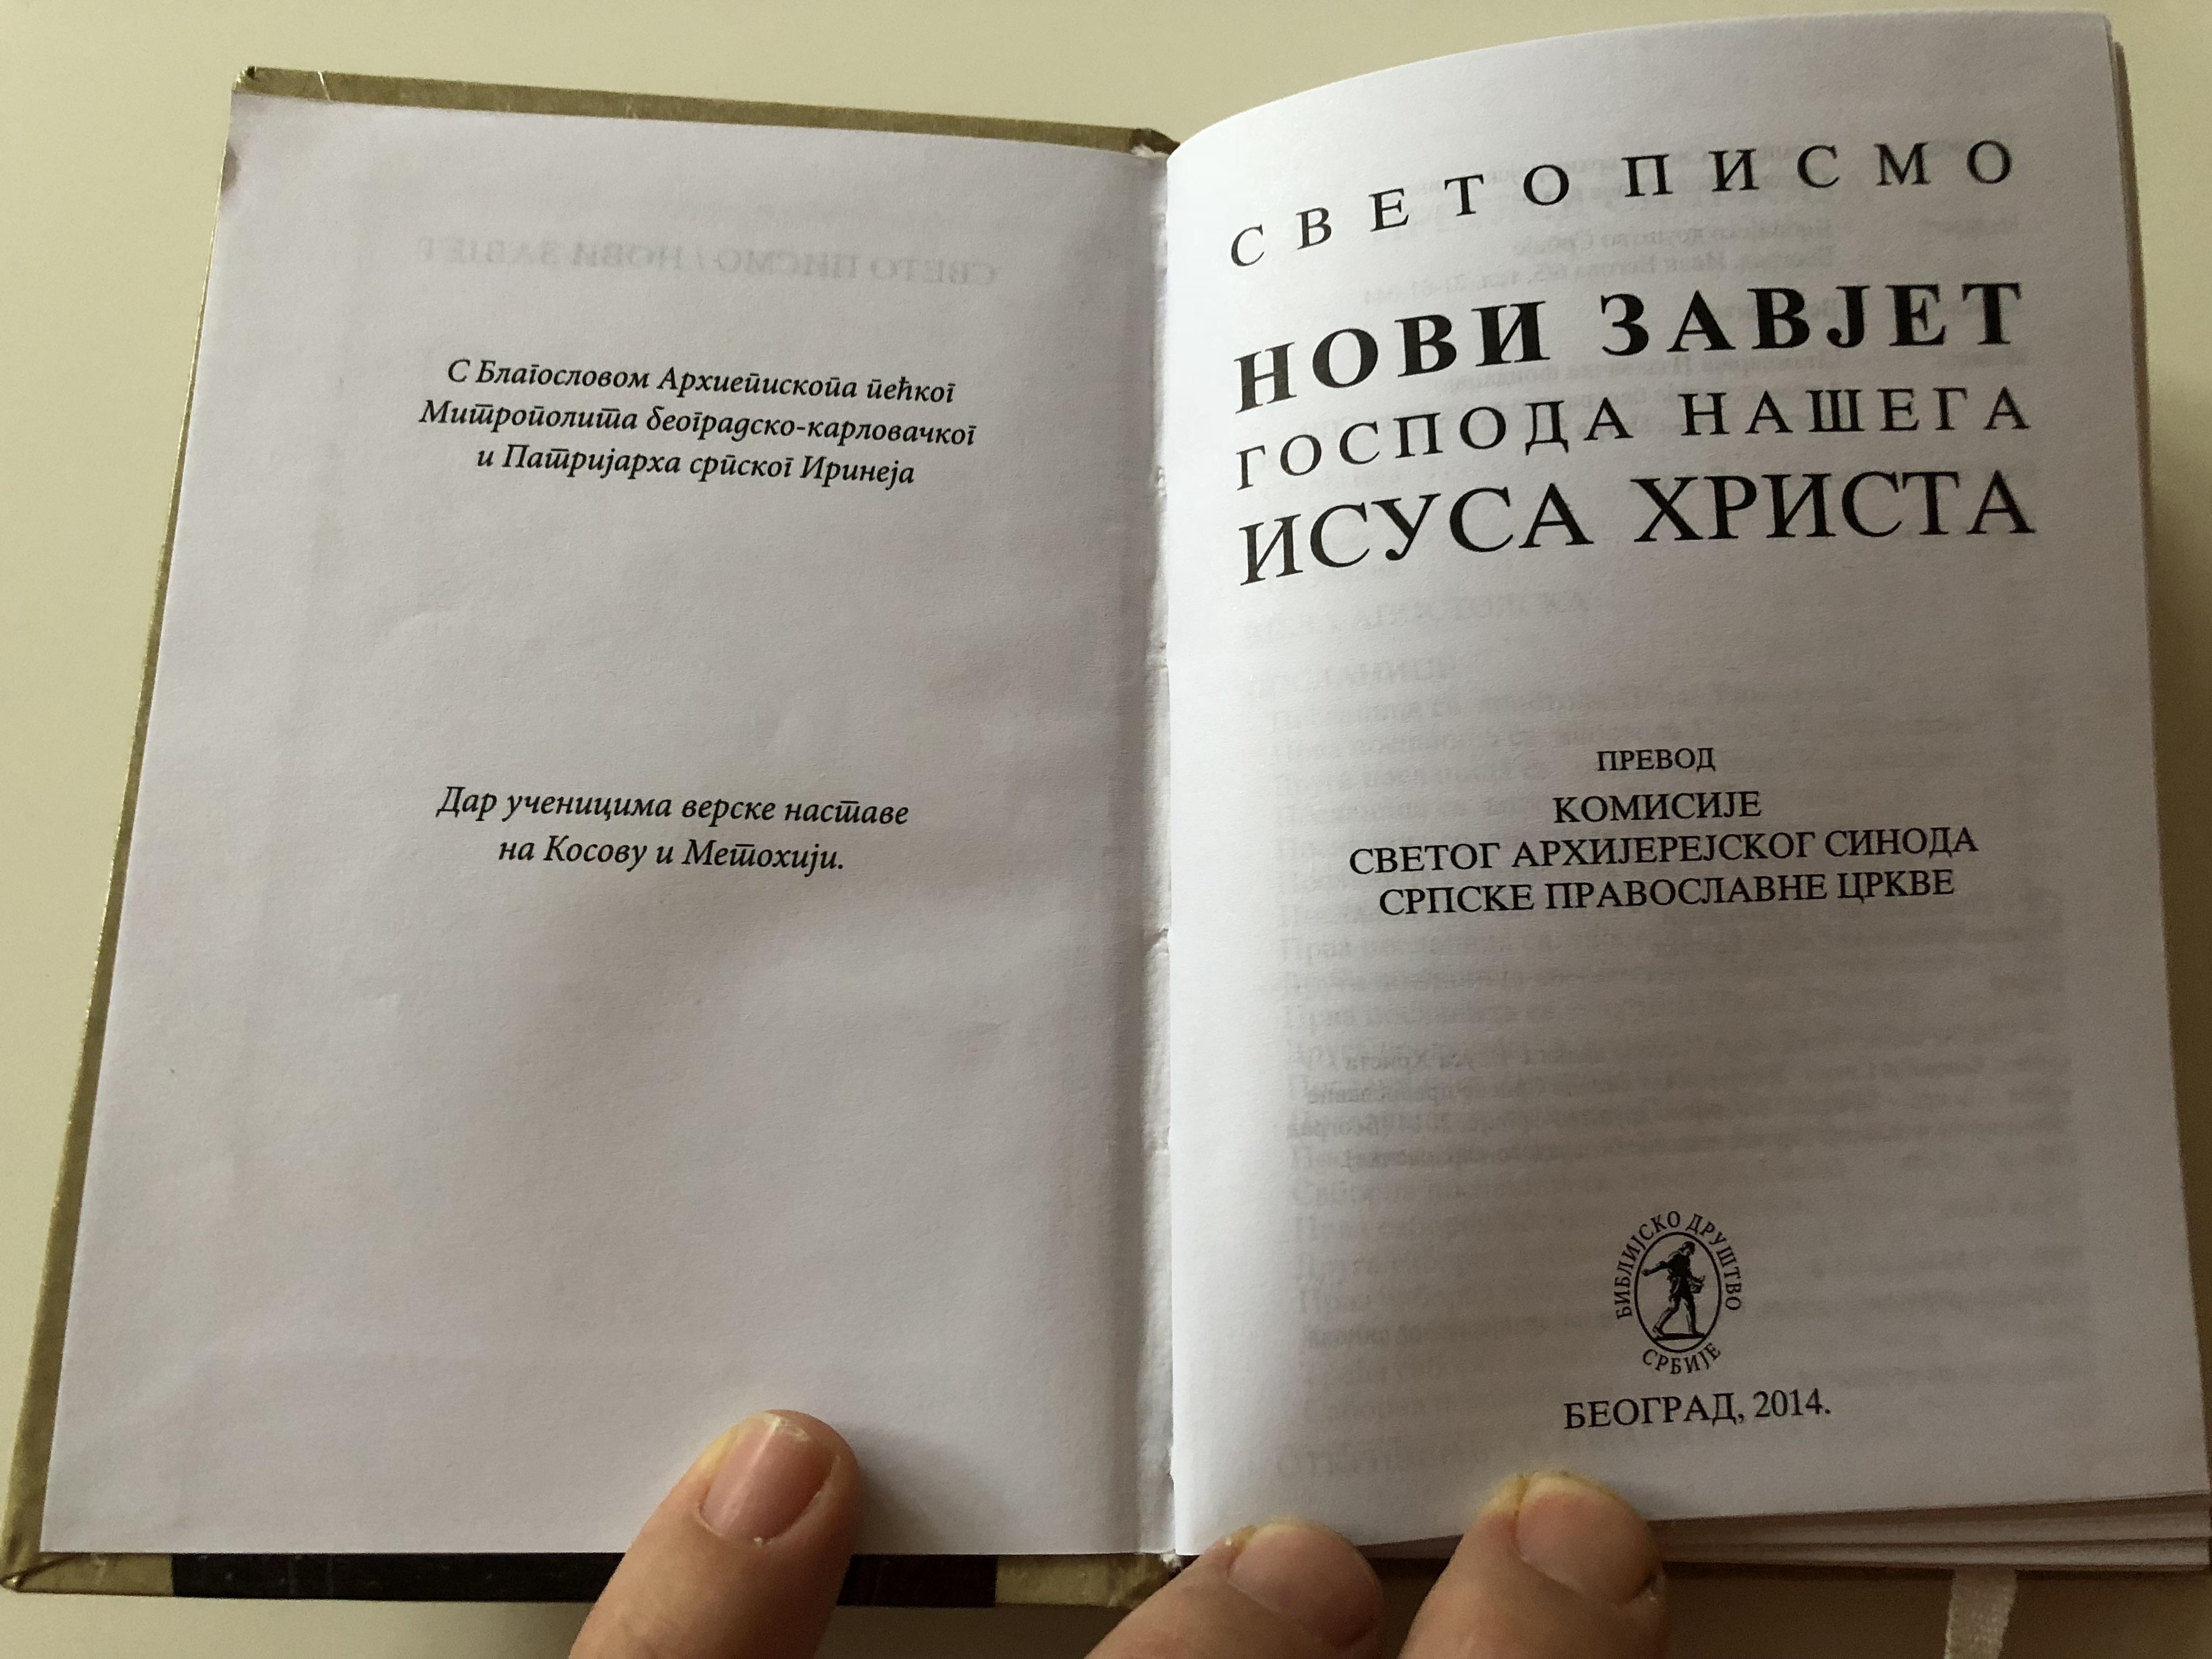 serbian-new-testament-jesus-hardcover-3-.jpg